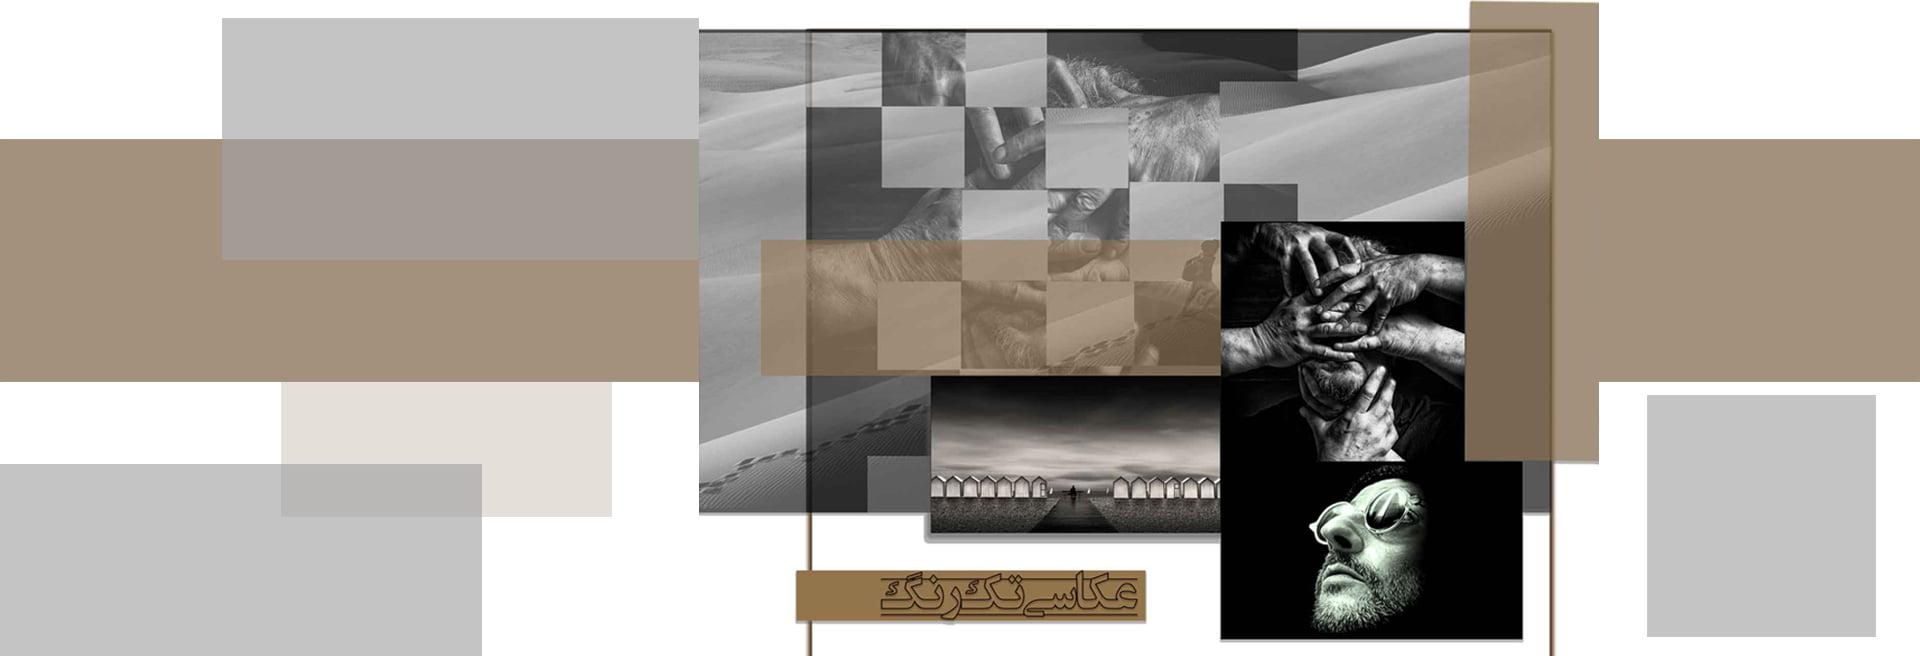 Black and White World 1 1 1 - چگونه می توان تصاویر را تک رنگ فرض کرد؟